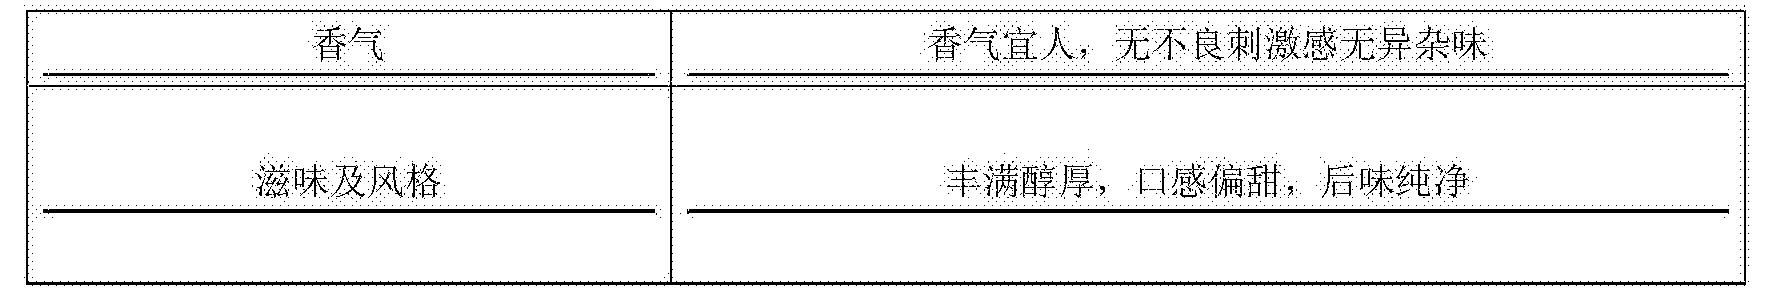 Figure CN107557224AD00061